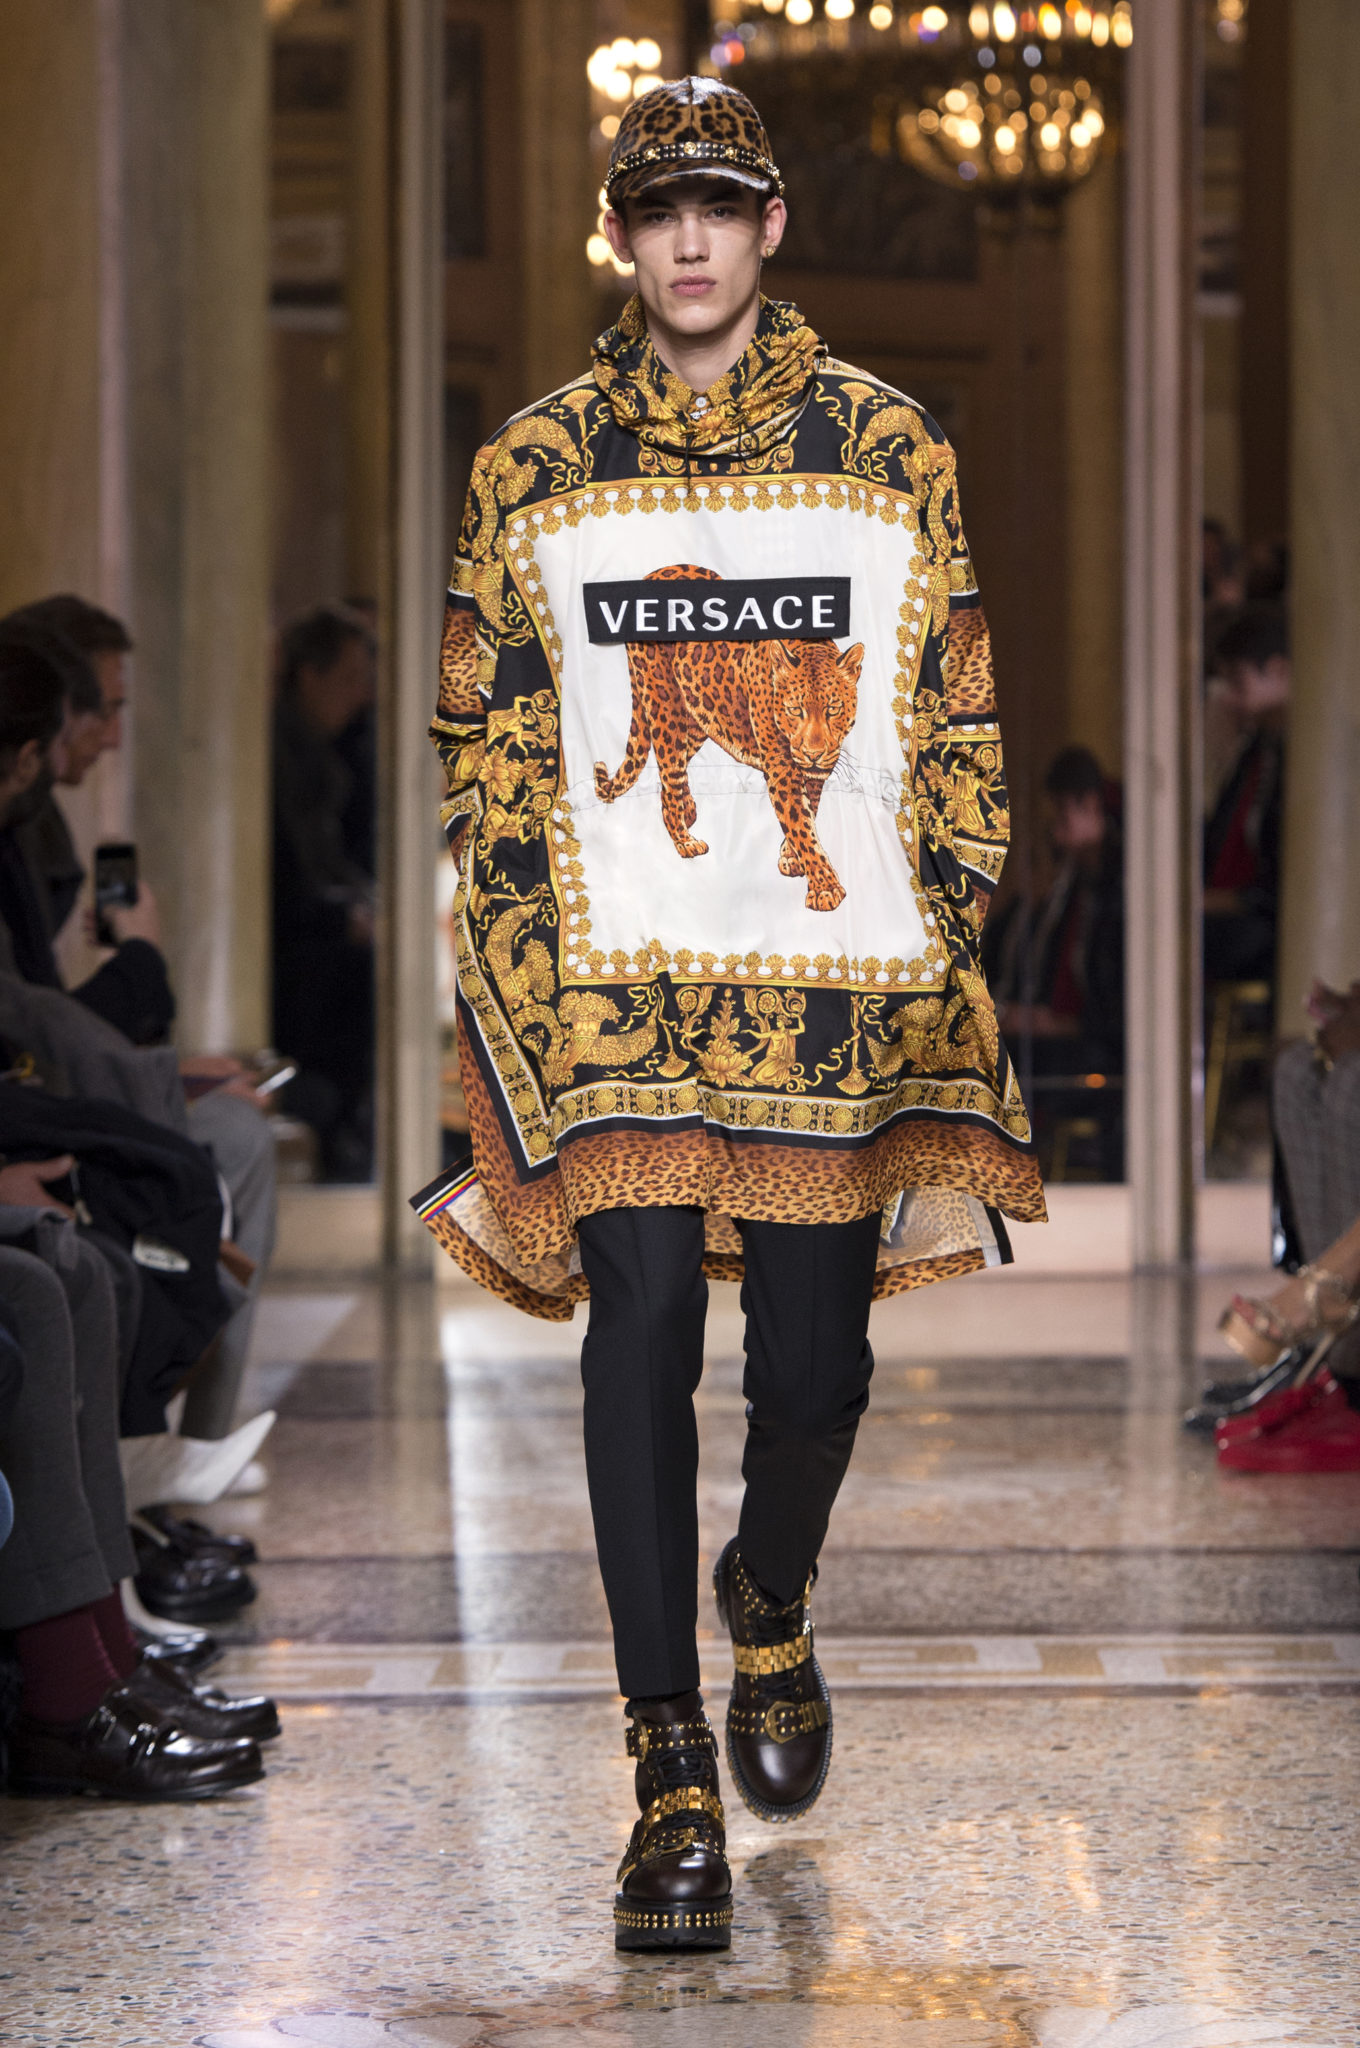 Versace - Fashion Week Homme Milan Automne-Hiver 2018-2019 - Luxsure 17b4f01c573